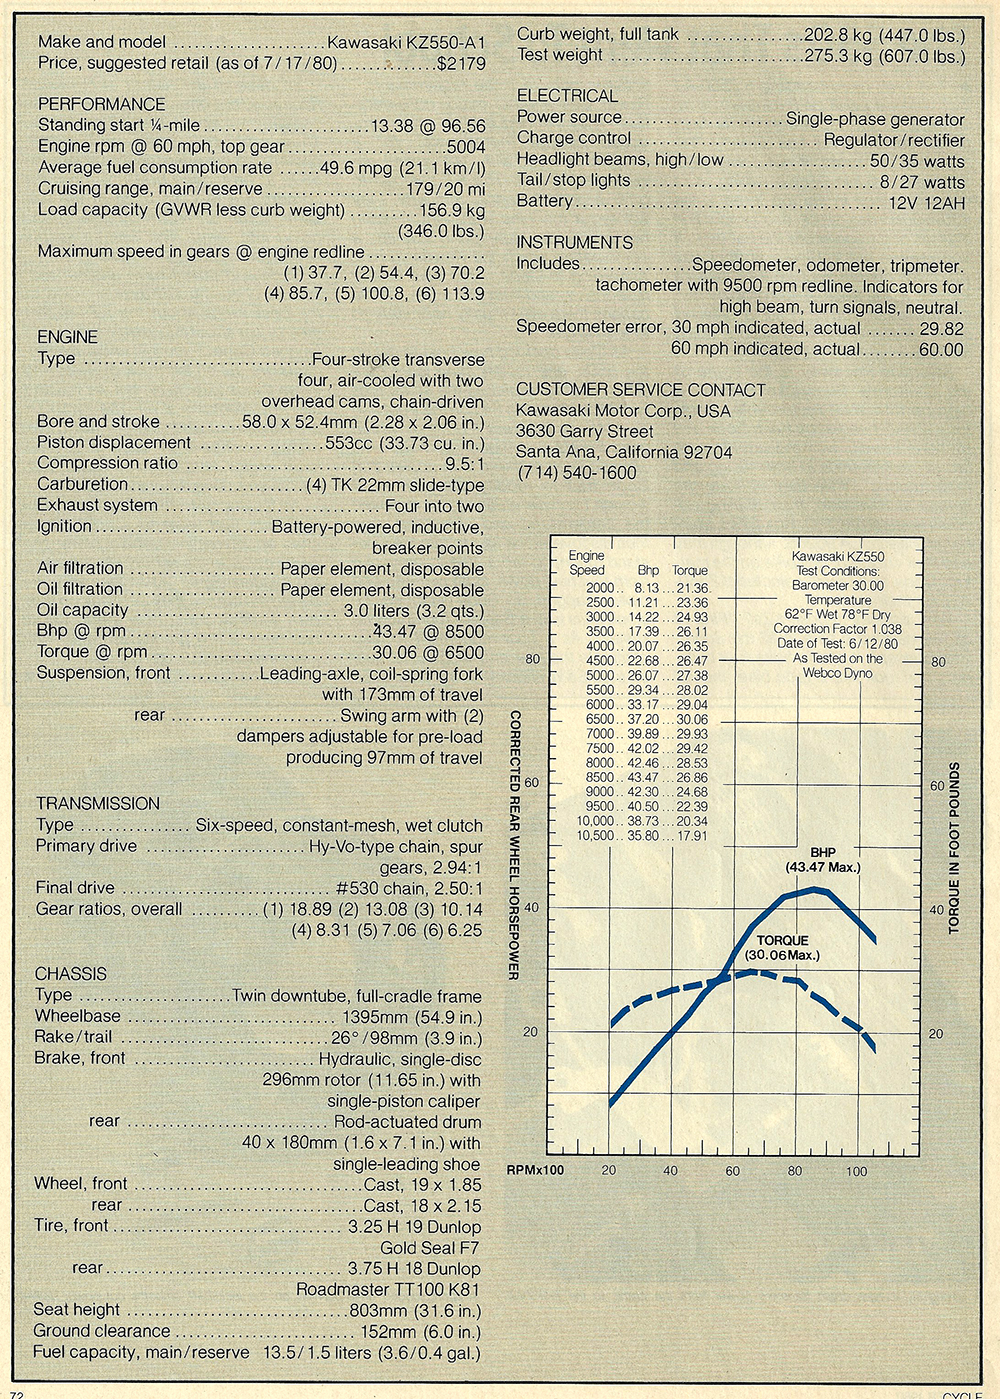 1980 Kawasaki KZ550 road test 06.jpg